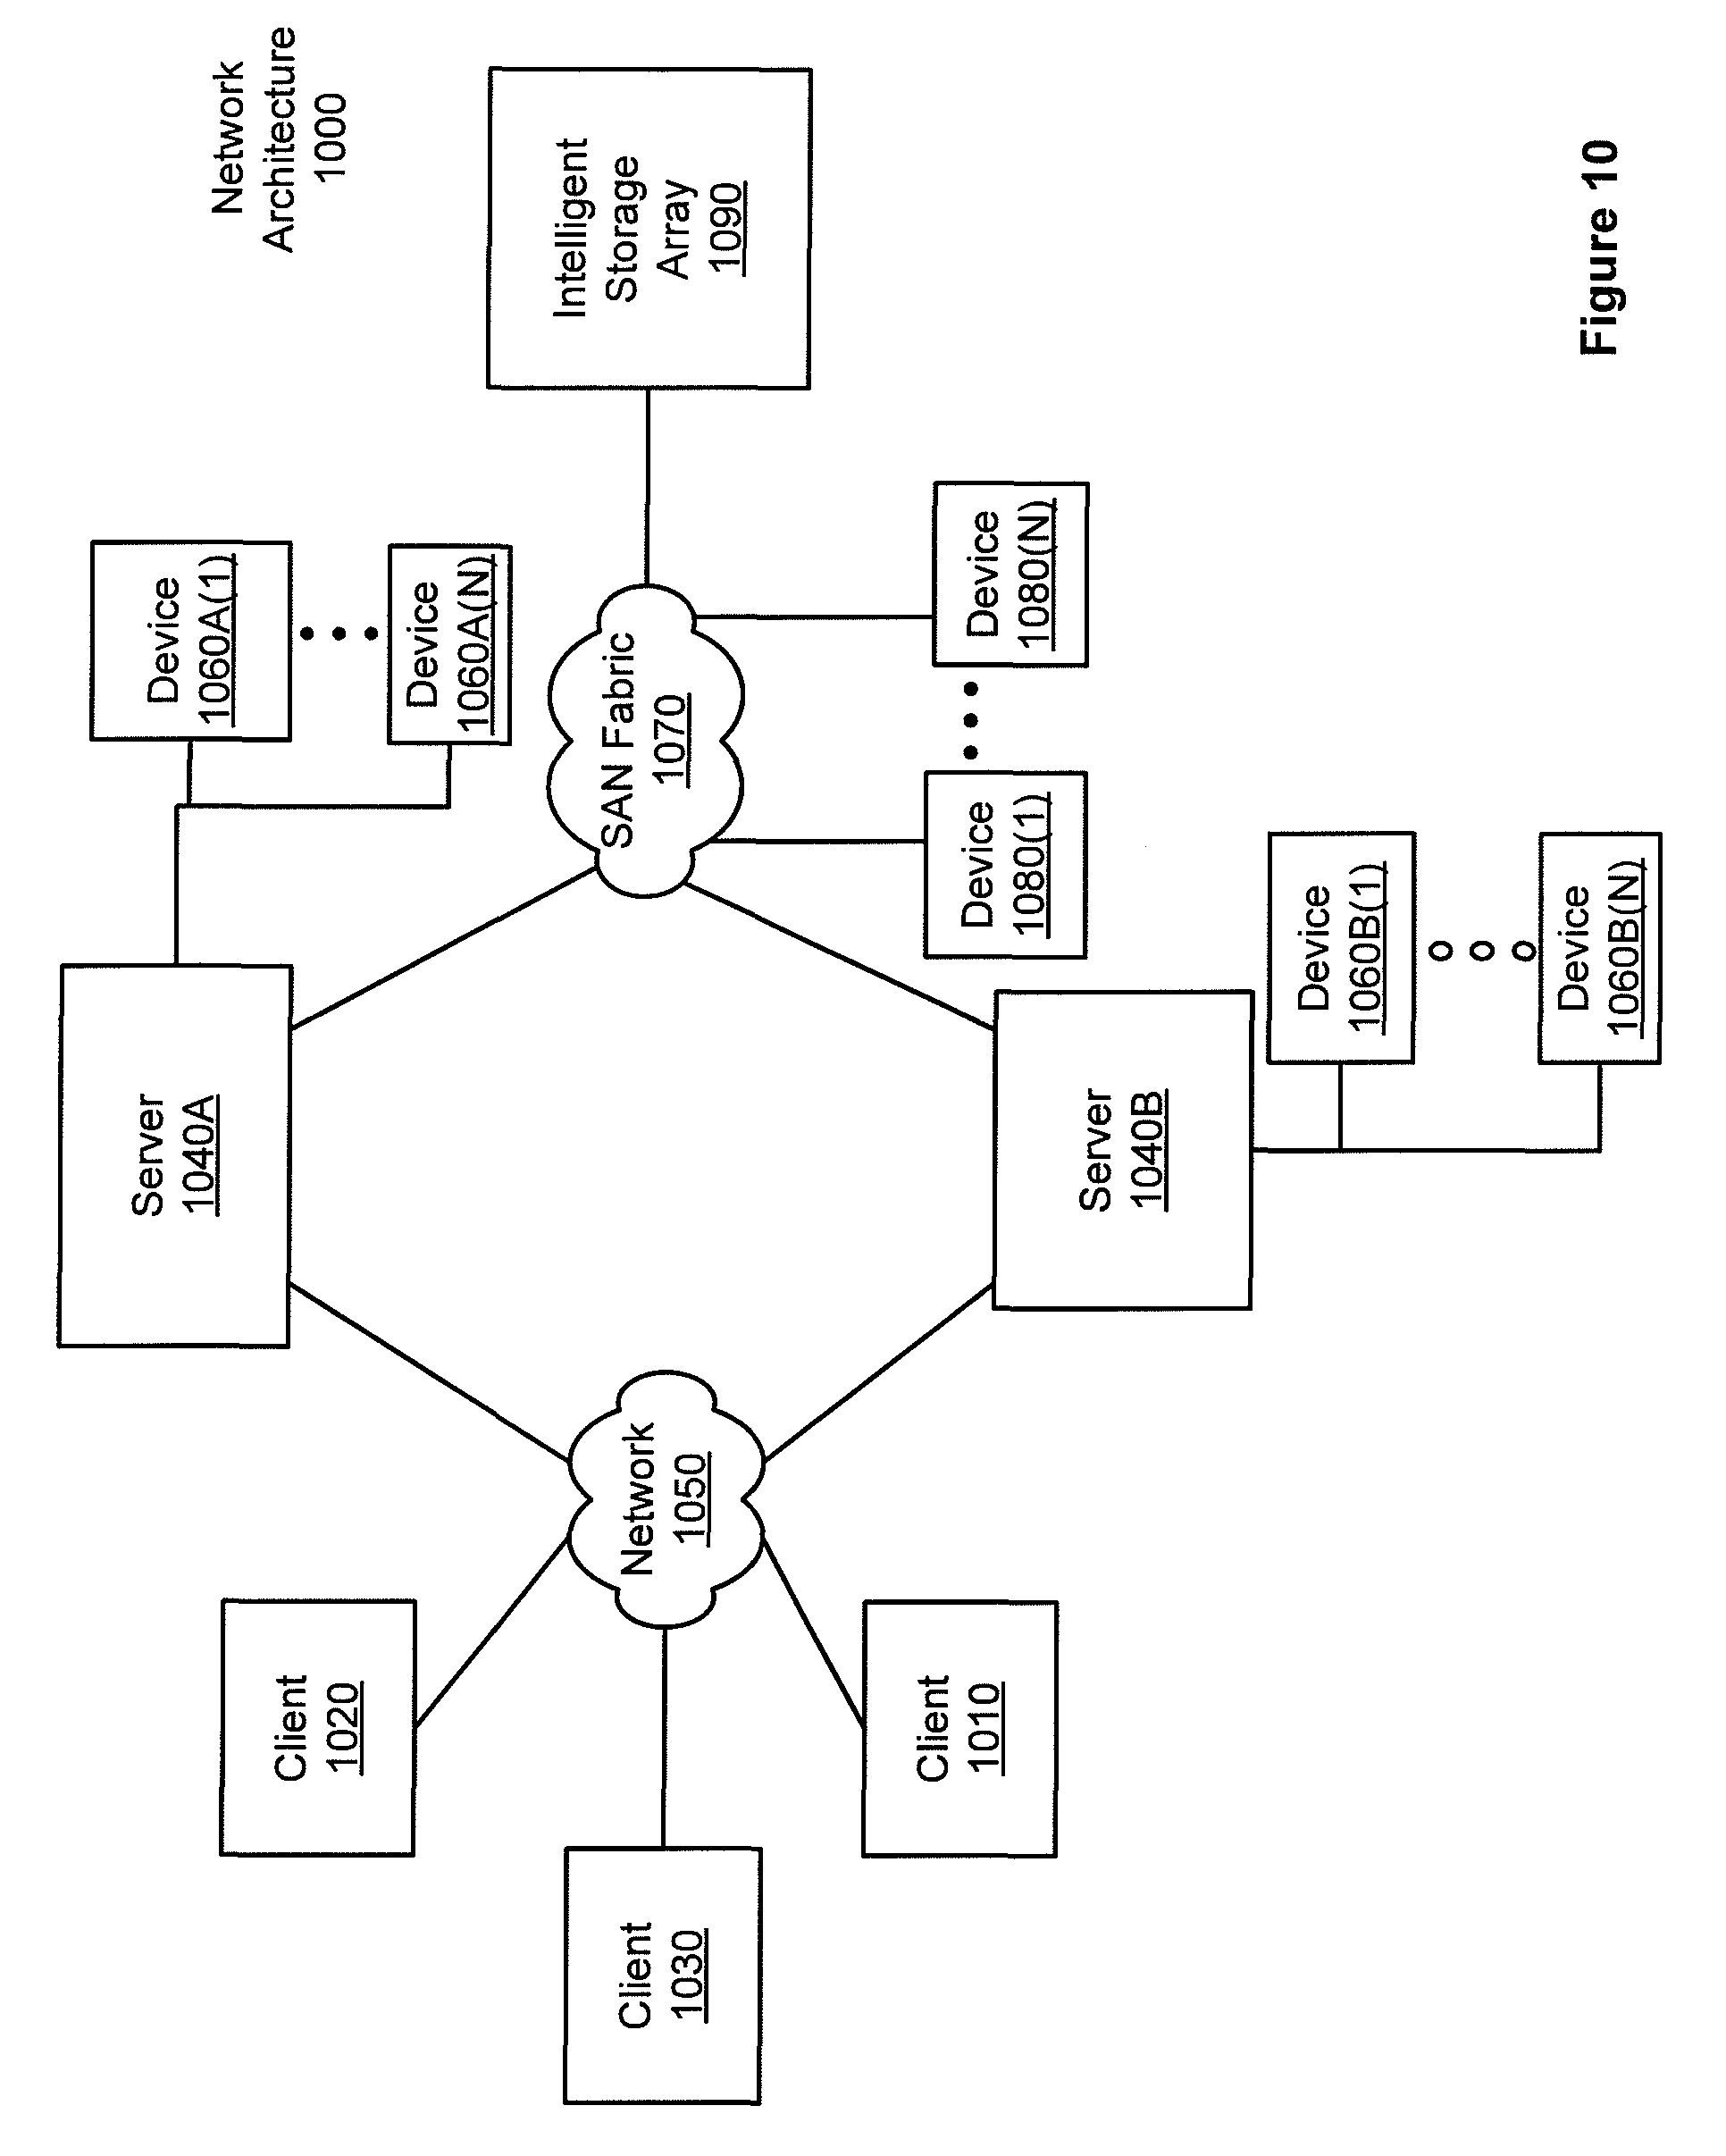 patent us 9 412 248 b1 Ansel System Fire Alarm Blueprint Symbols petitions